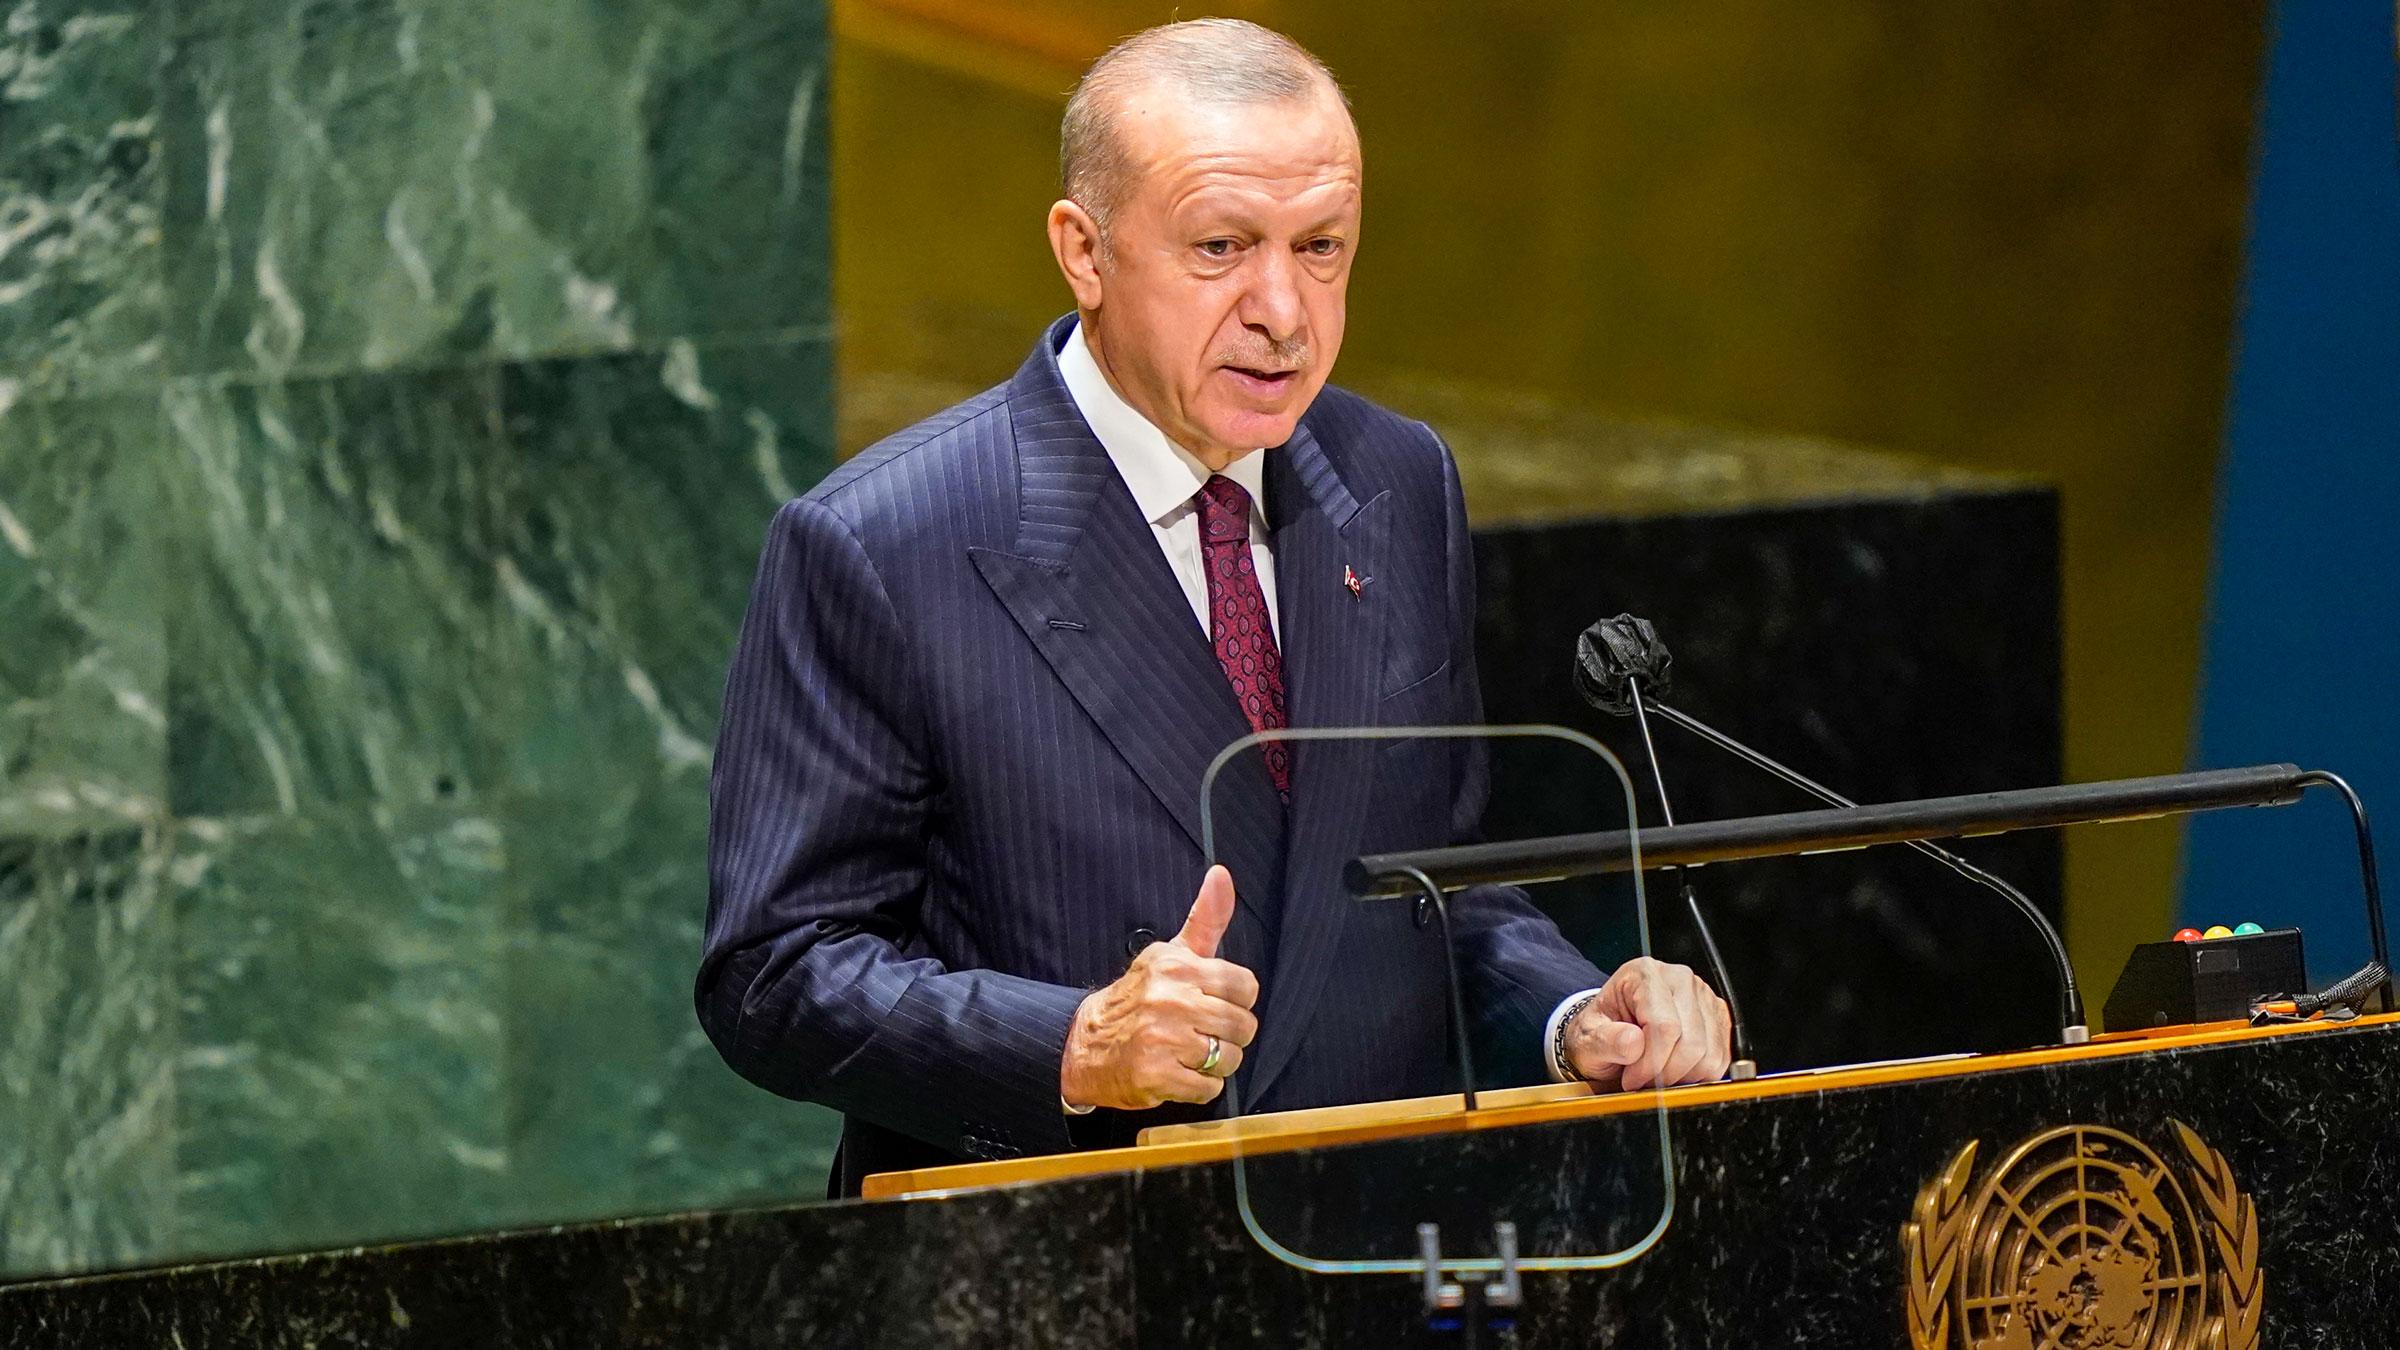 Turkish President Recep Tayyip Erdogan addresses the General Assembly on Tuesday.